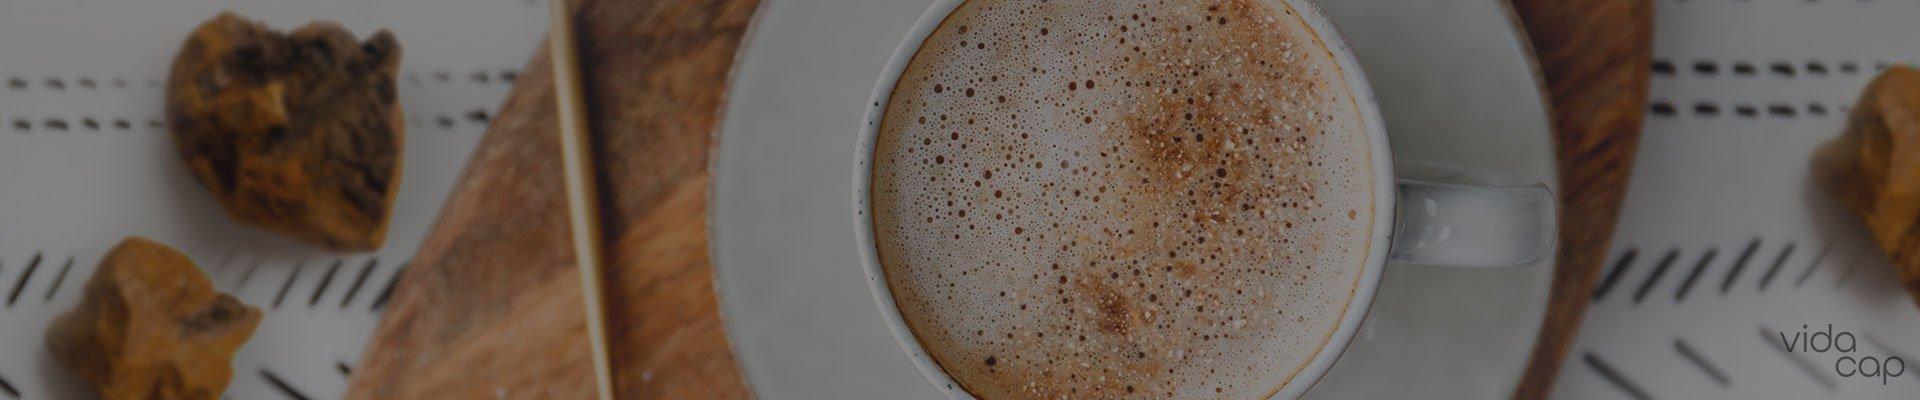 banner-how-to-make-a-chaga-latte